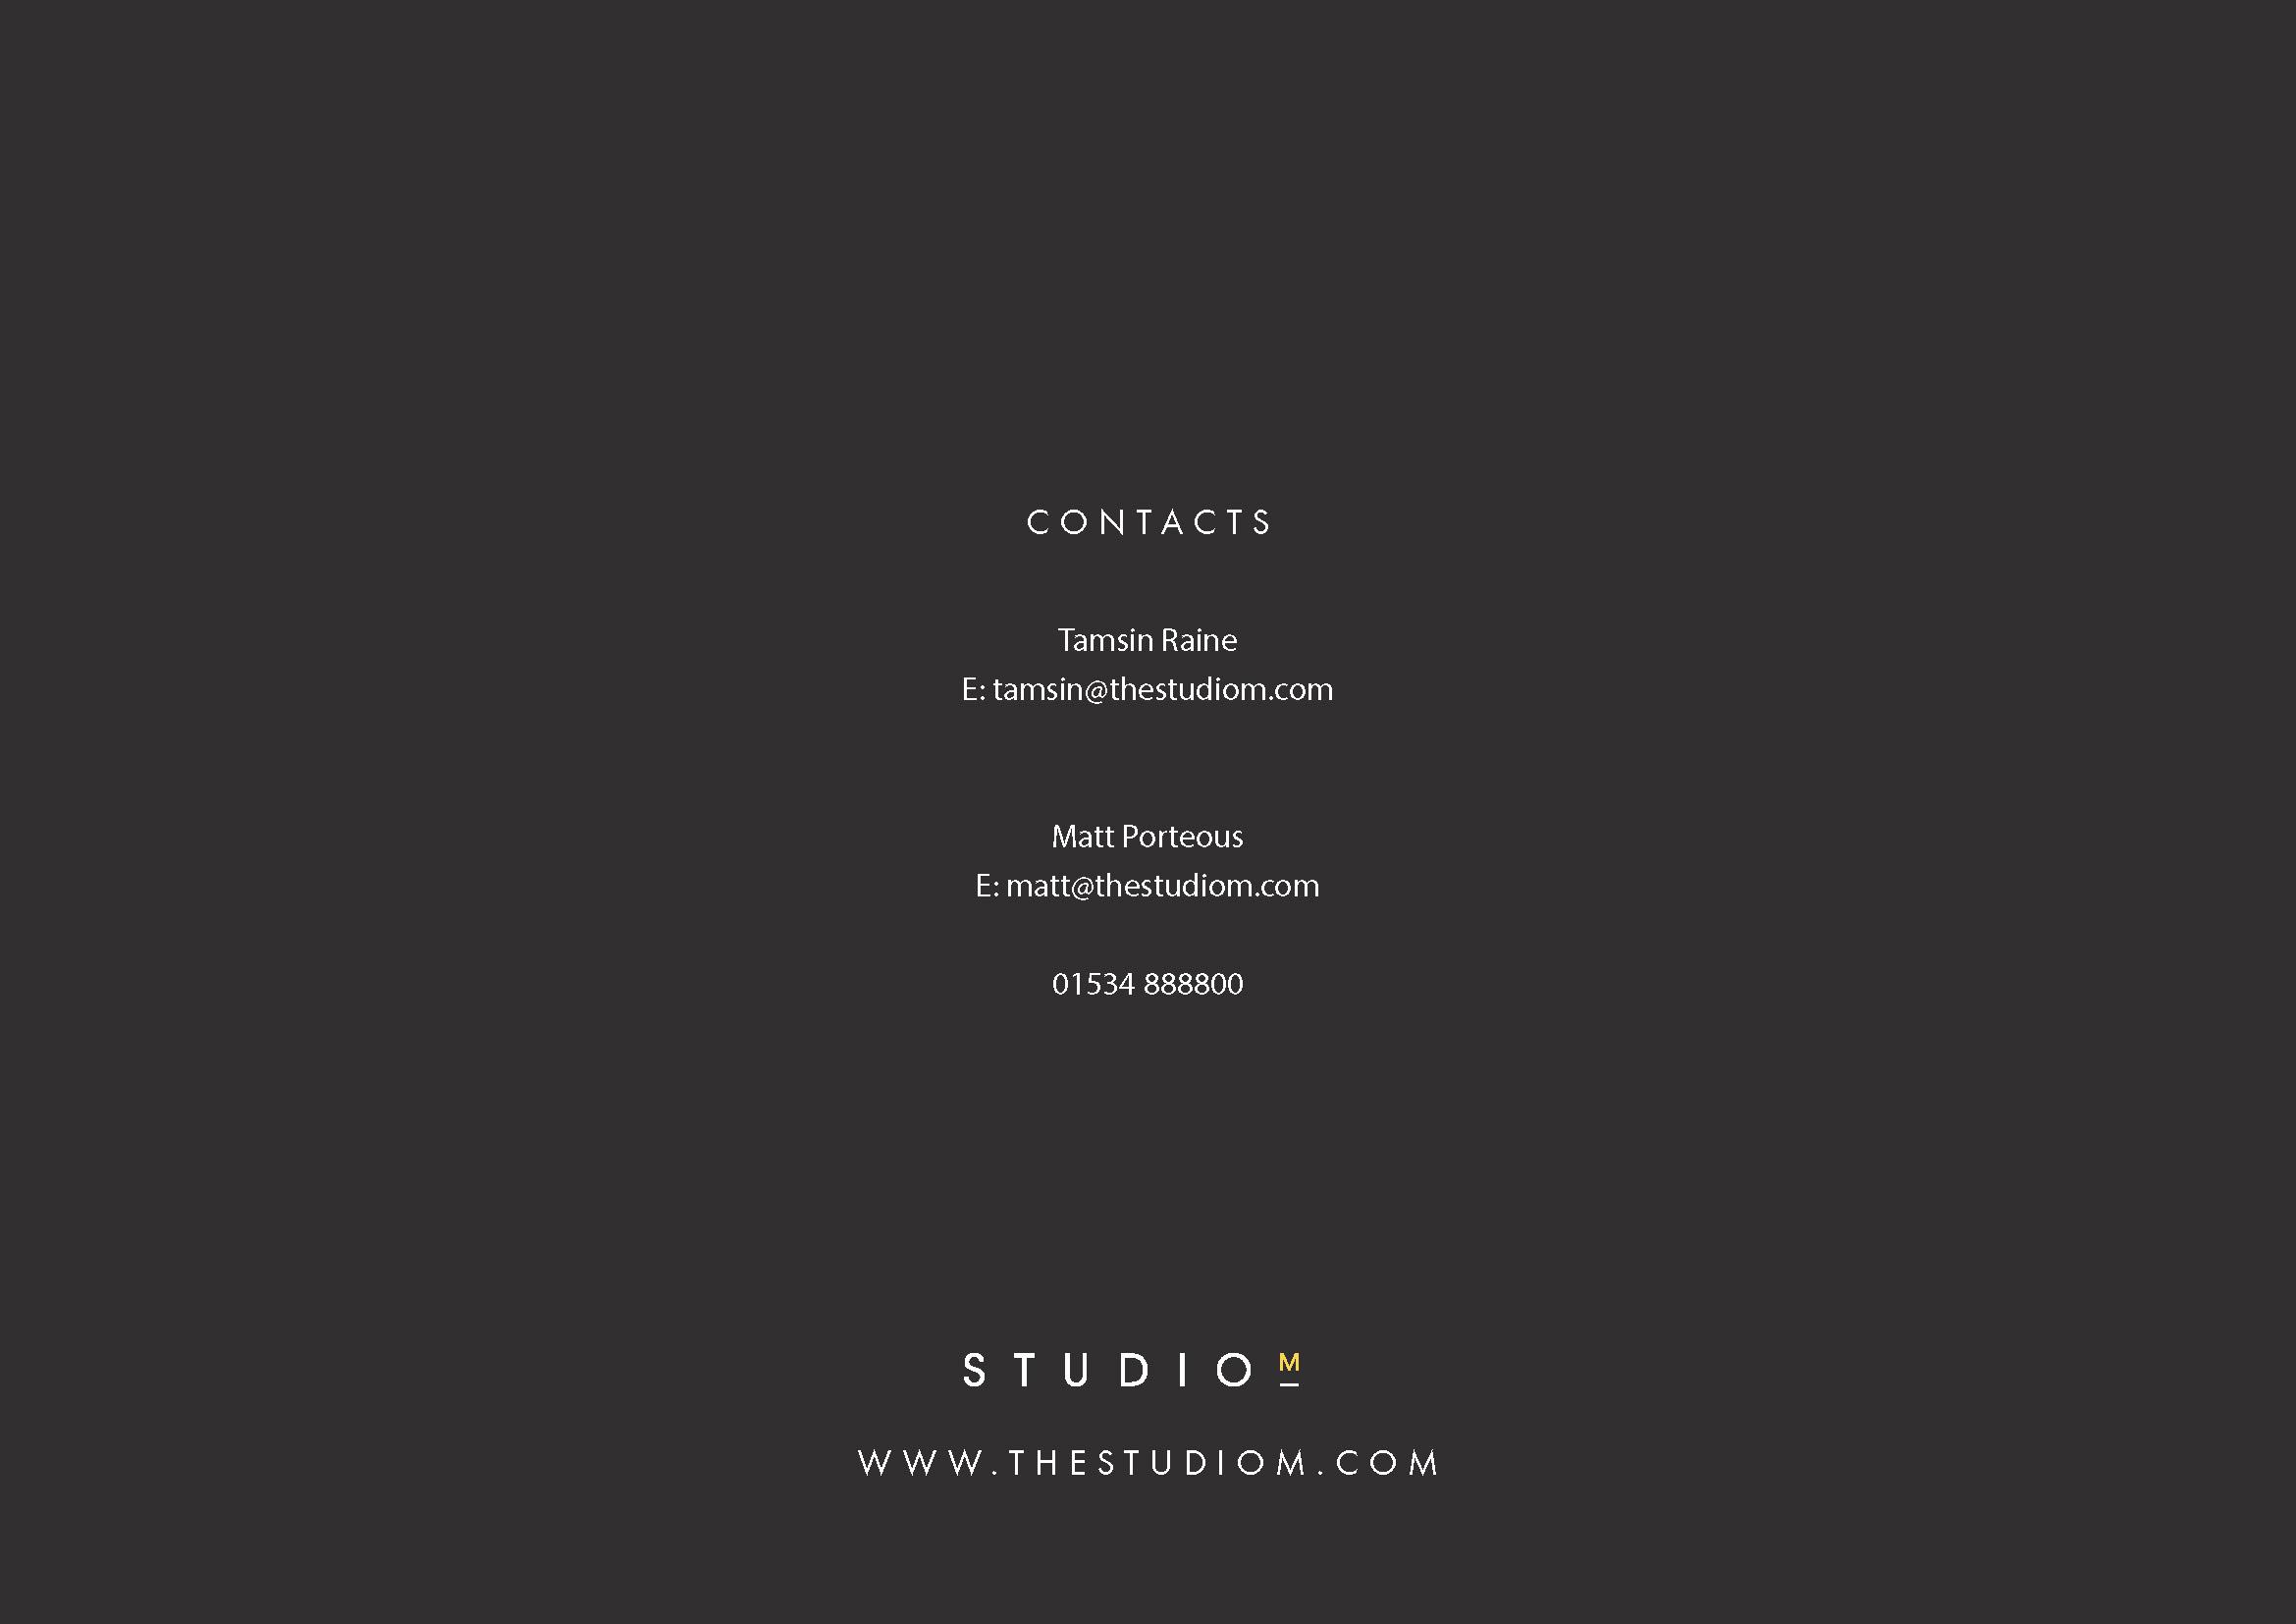 STUDIO_M FOR CHANGE _ INVITE PDF_Page_17.jpg